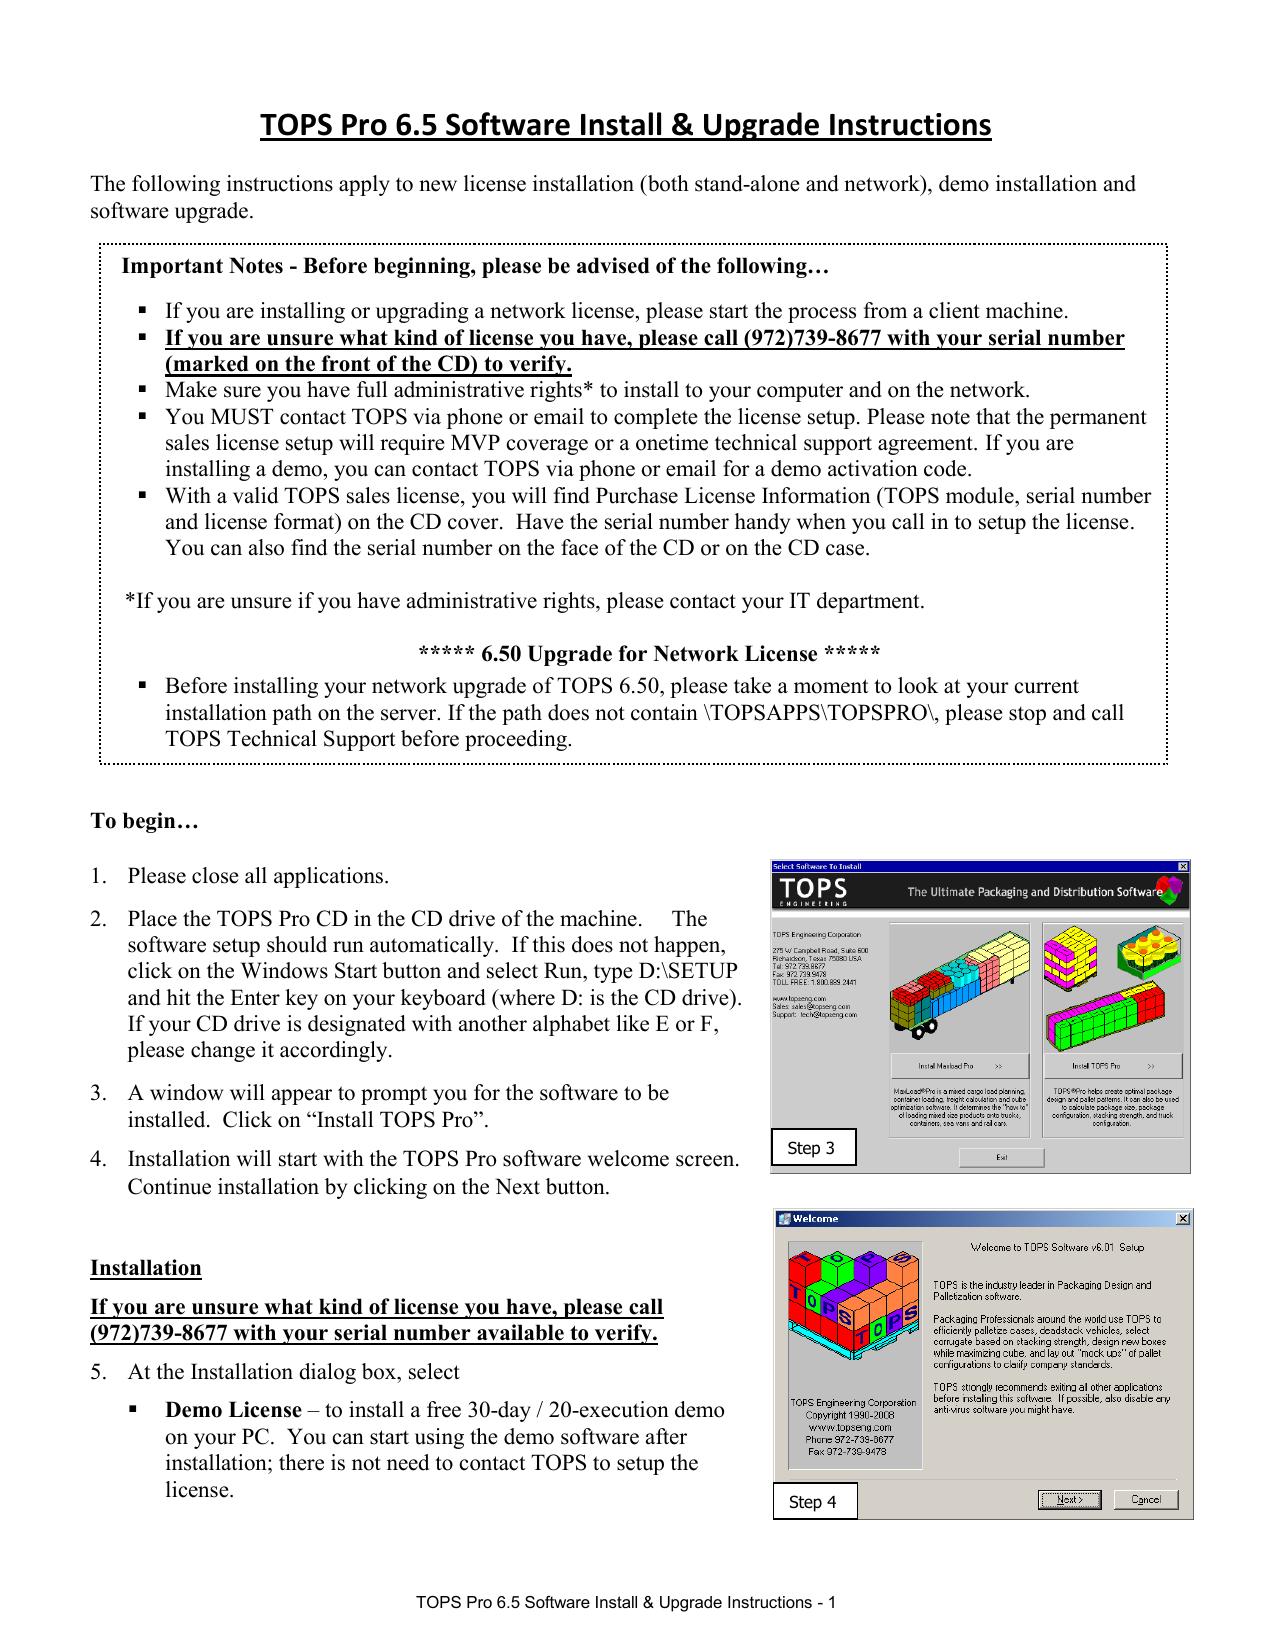 v6 5 Installation and Upgrade Instructions | manualzz com